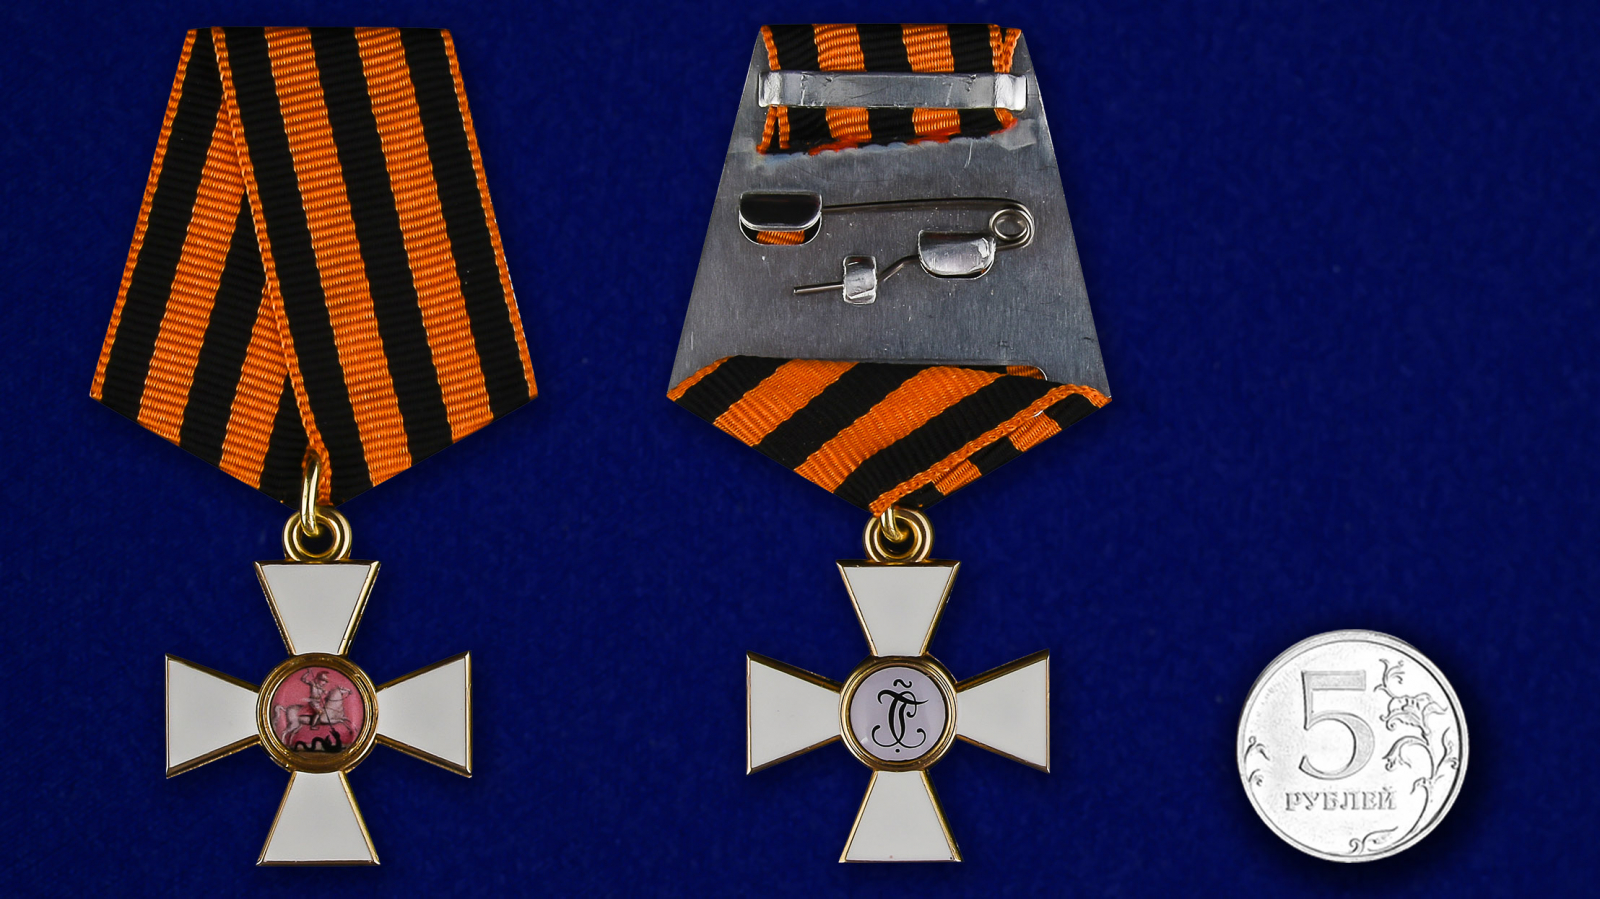 Цена знака ордена Святого Георгия 4 степени